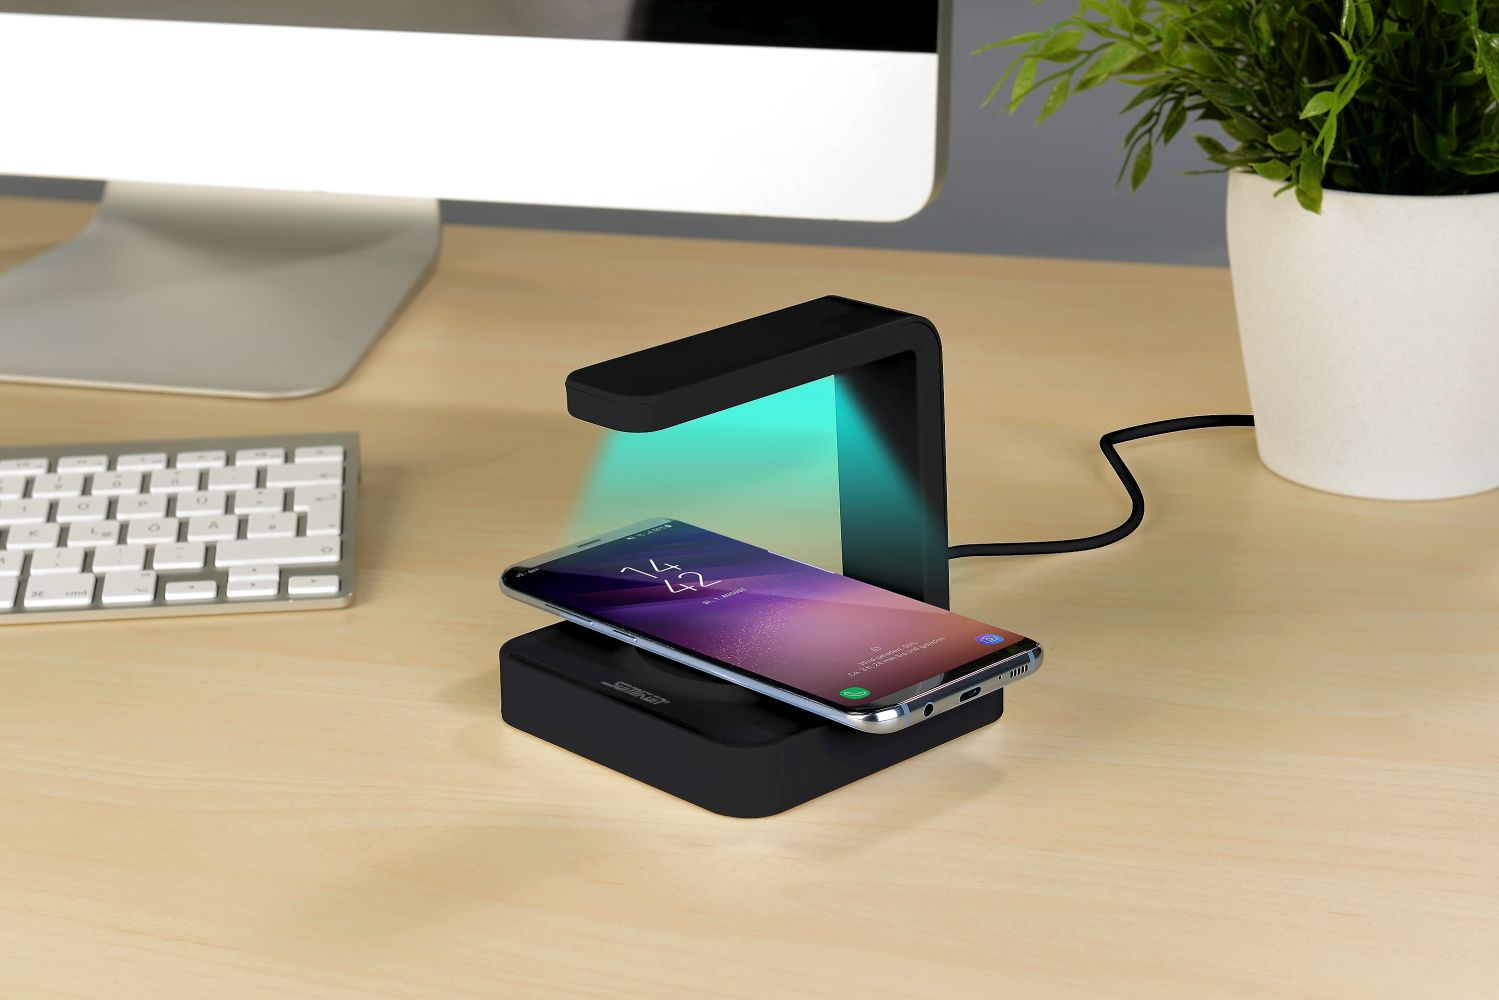 Somikon 2in1-Smartphone-Ladestation mit UV-Desinfektions-Lampe, Qi-kompatibel, www.pearl.de